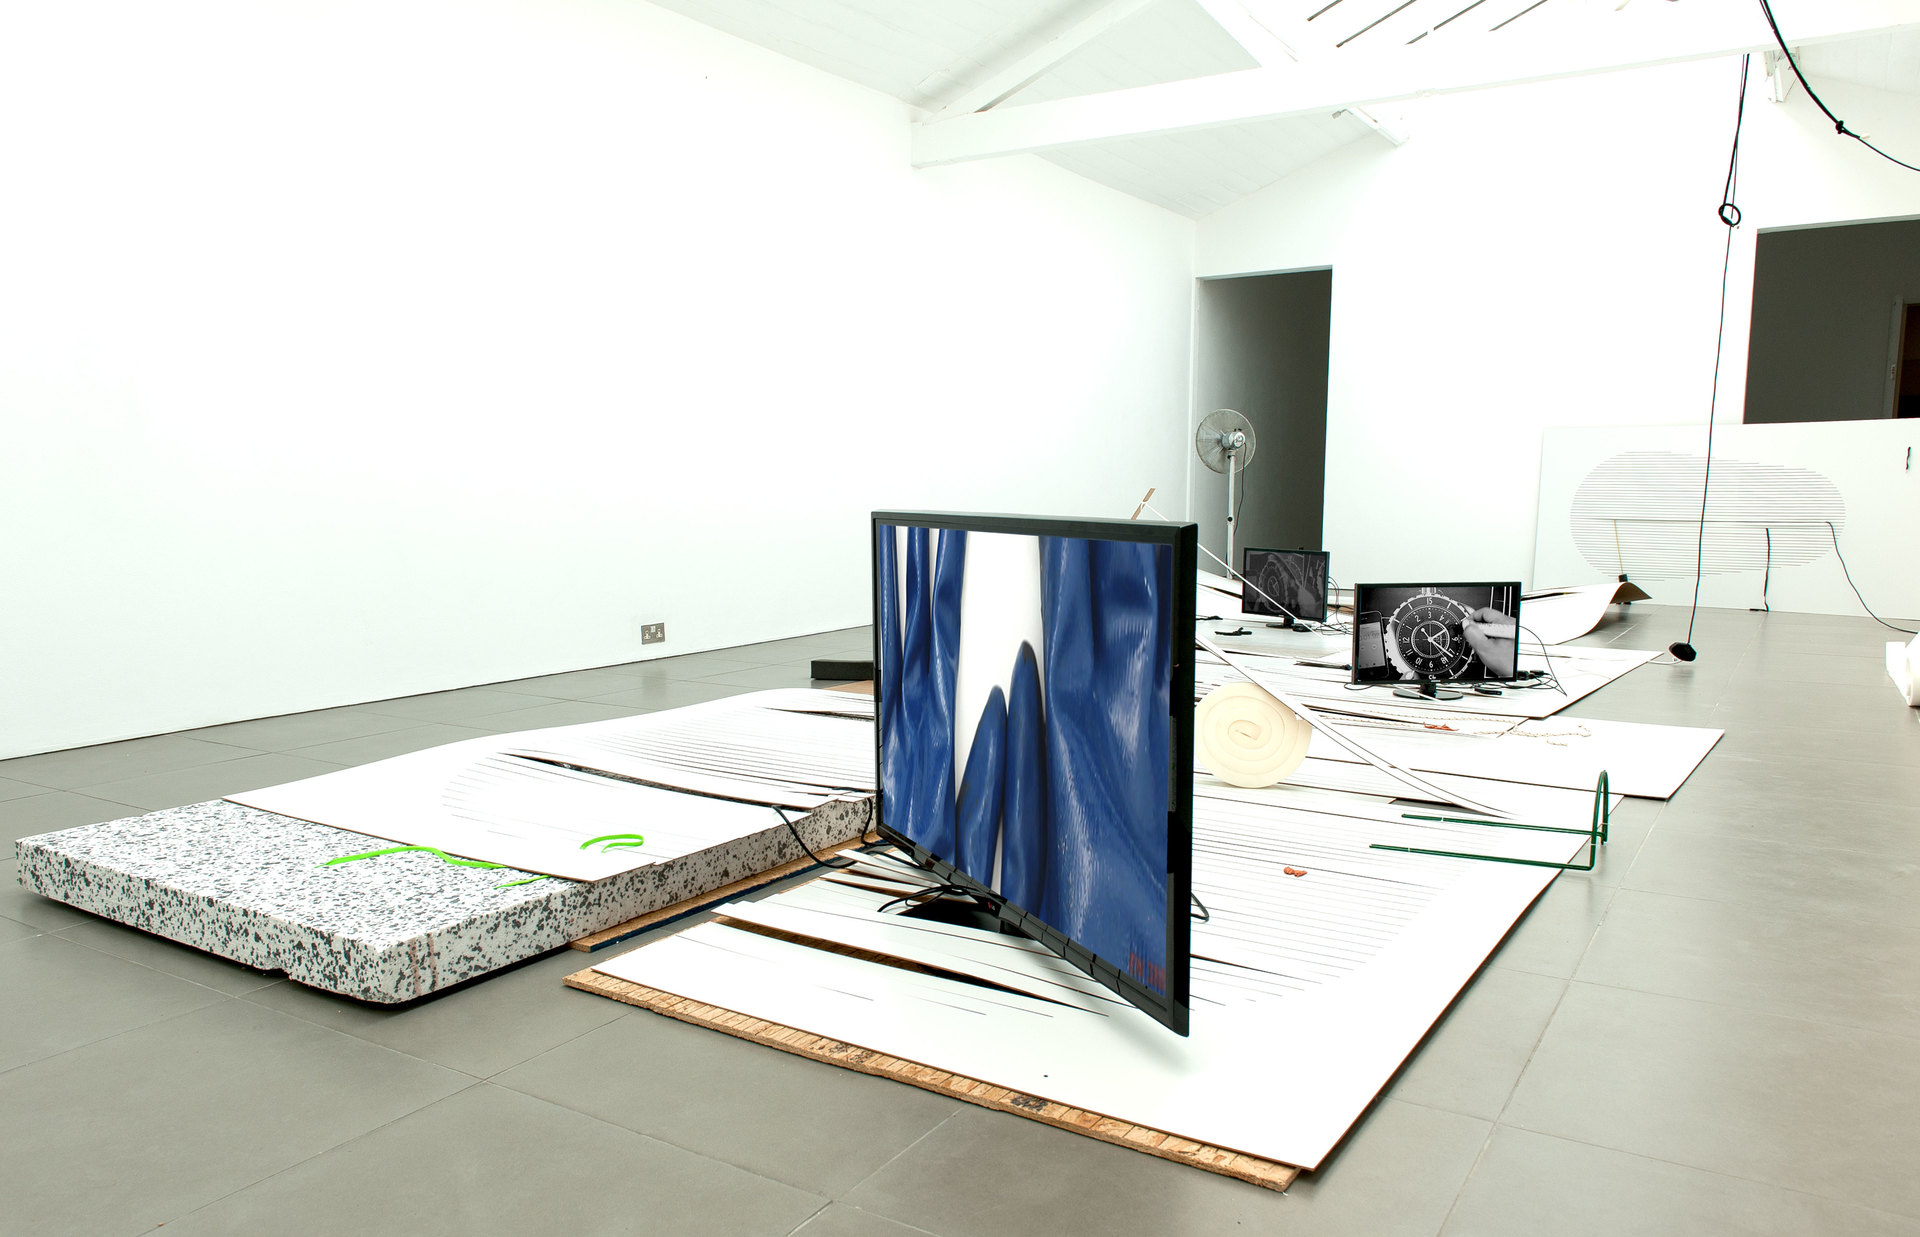 Beatriz Olabieretta, Shift Show, Cell Project space